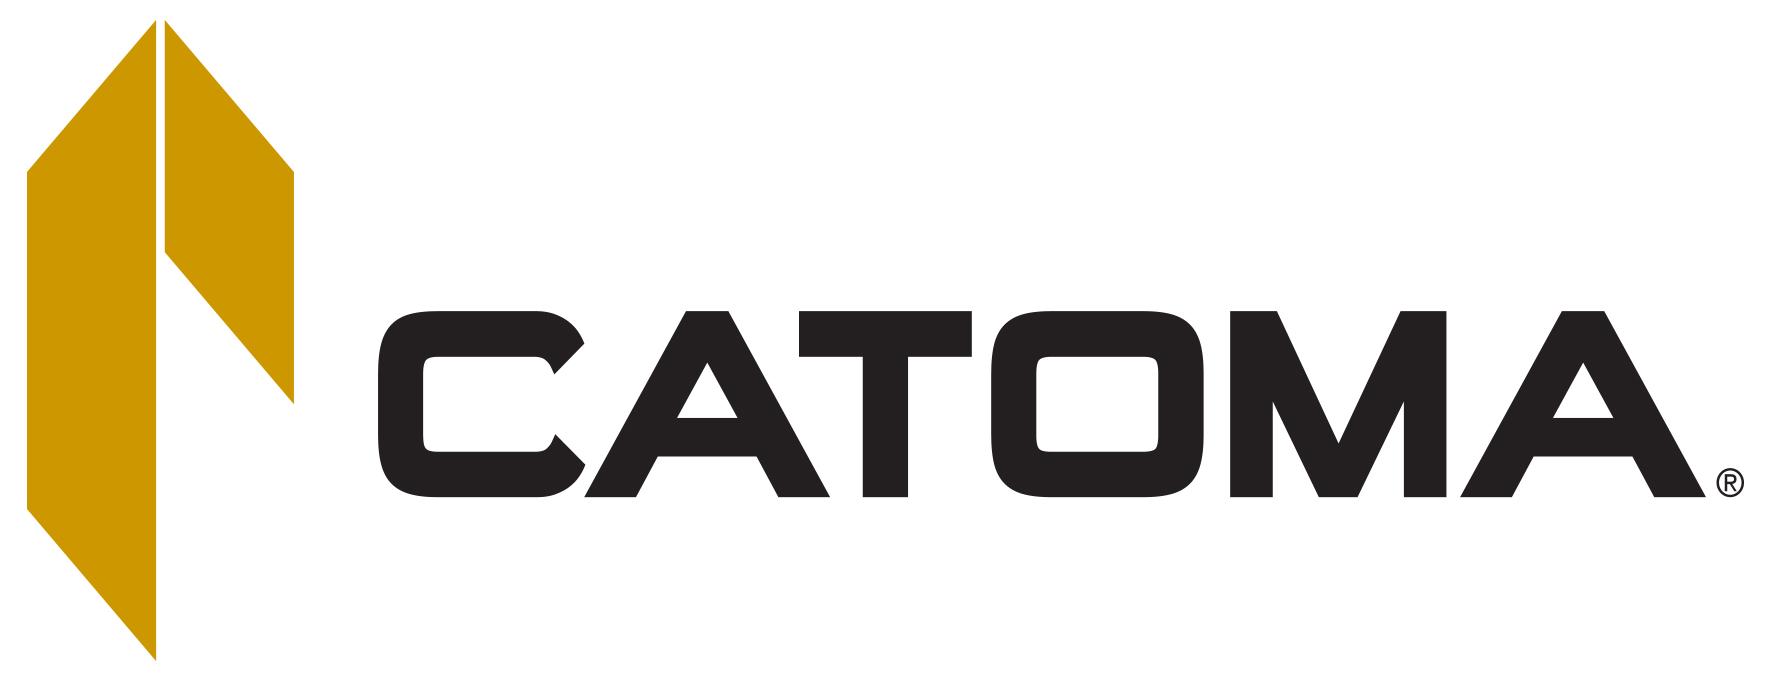 Catoma-logo_black_2019.jpg